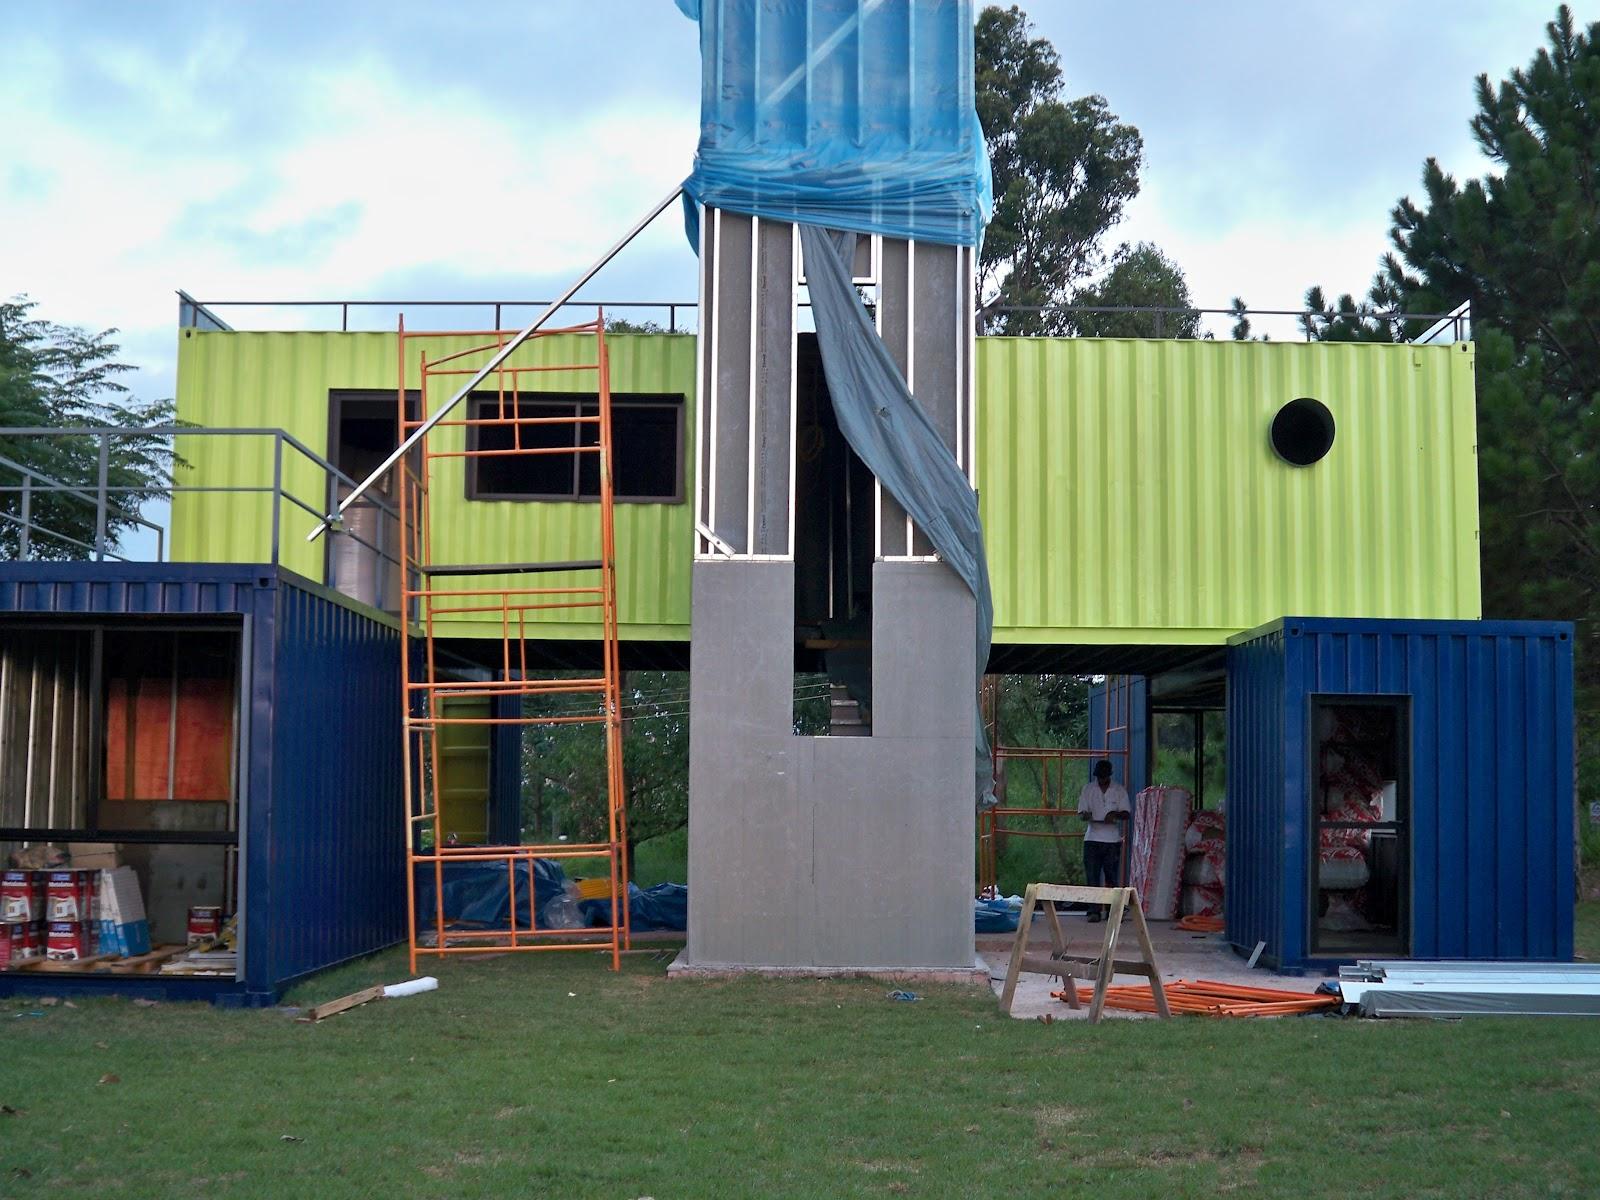 #183760 Casa Container Cotia SP 1892 Janela De Aluminio Sao Jose Dos Campos